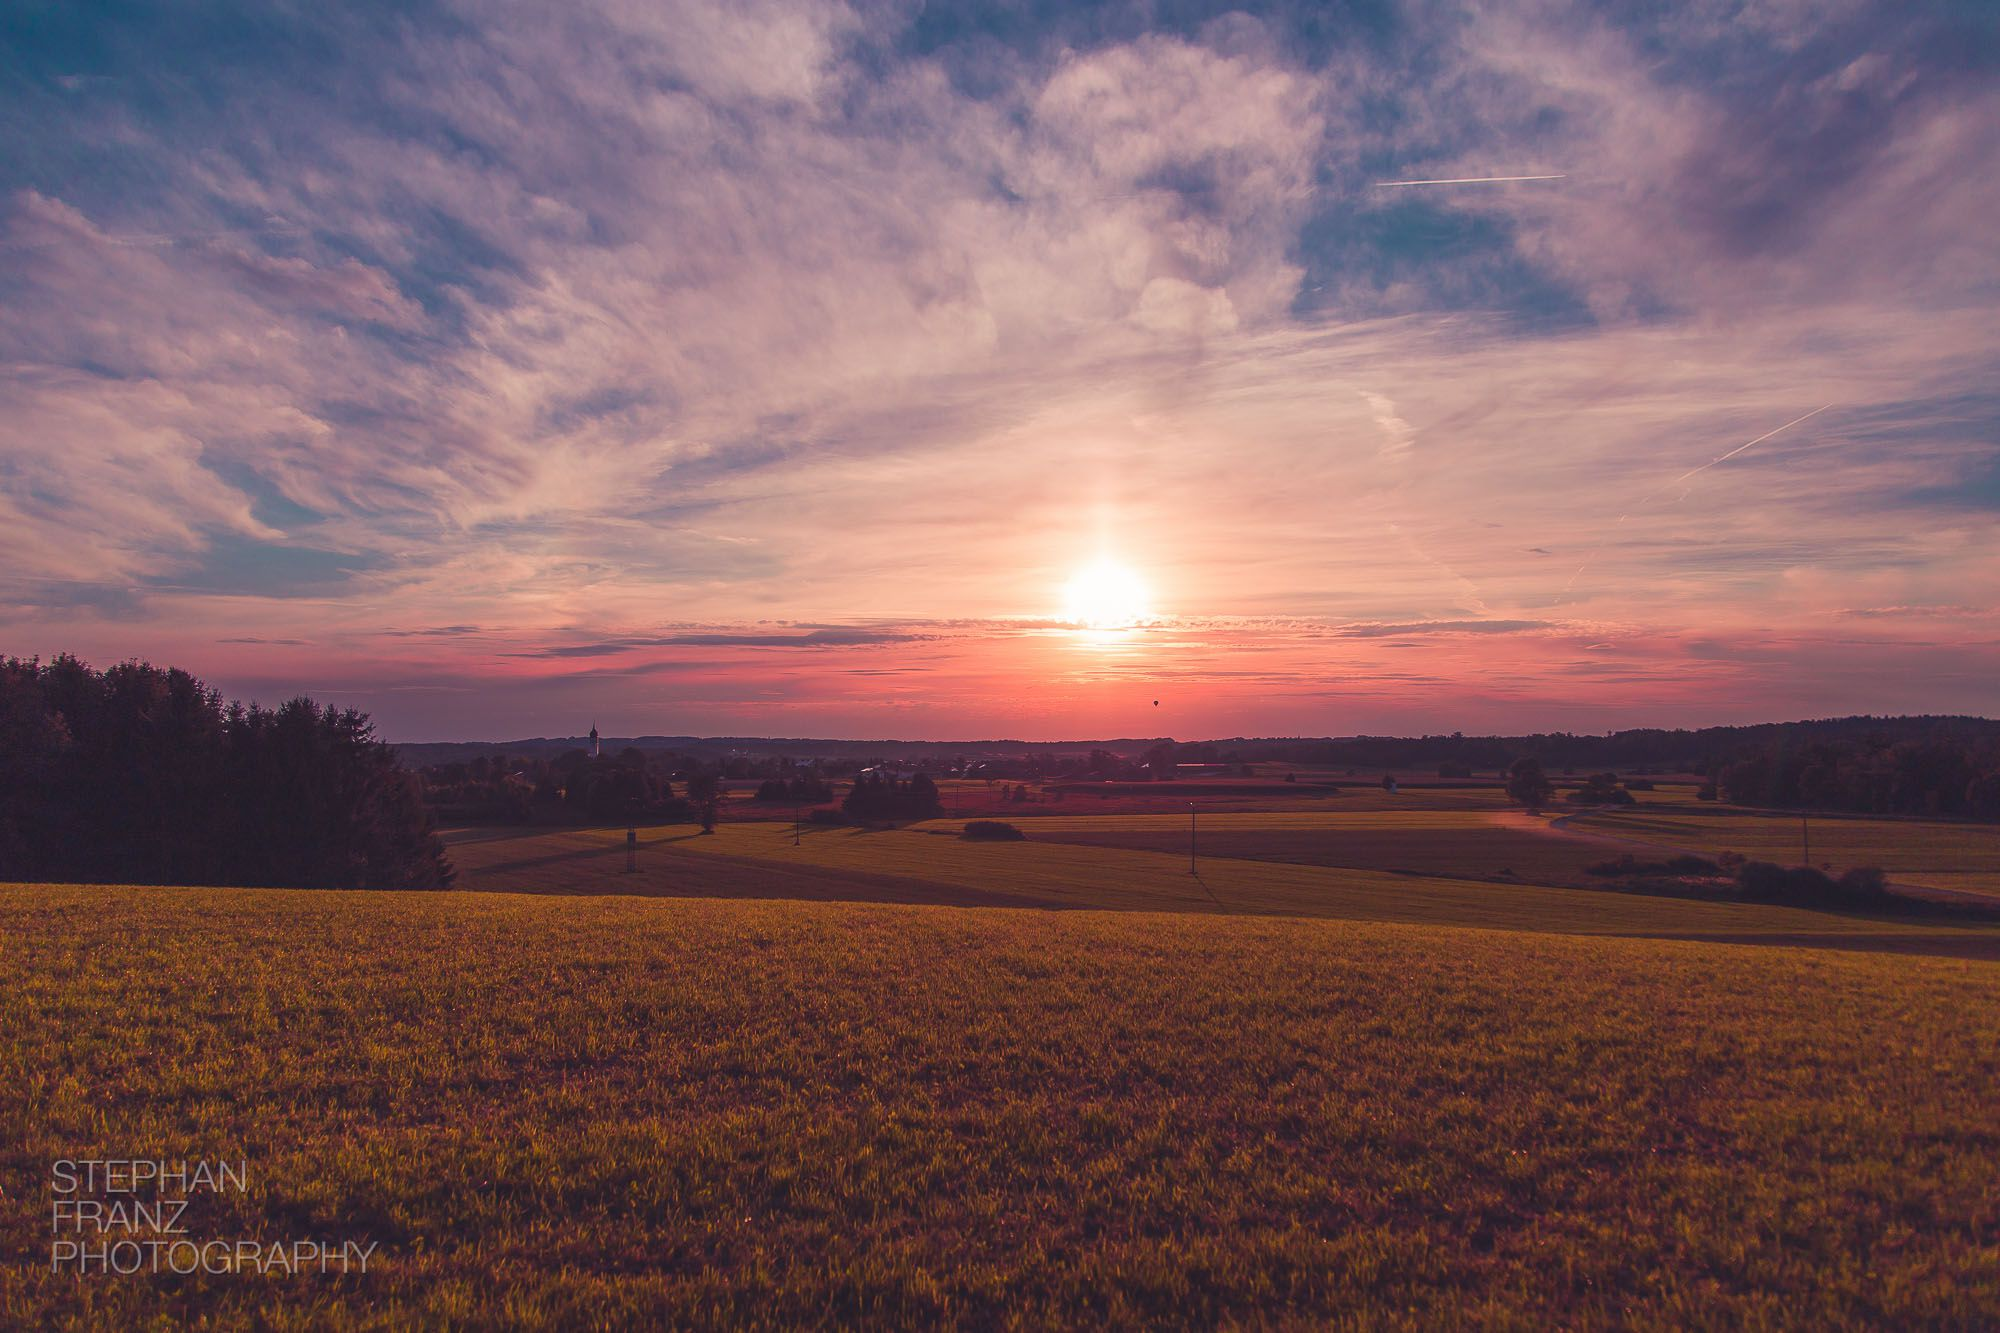 Sonnenuntergang-Ballon-Bayern-Stephan-Franz-Fotograf-Photography-1